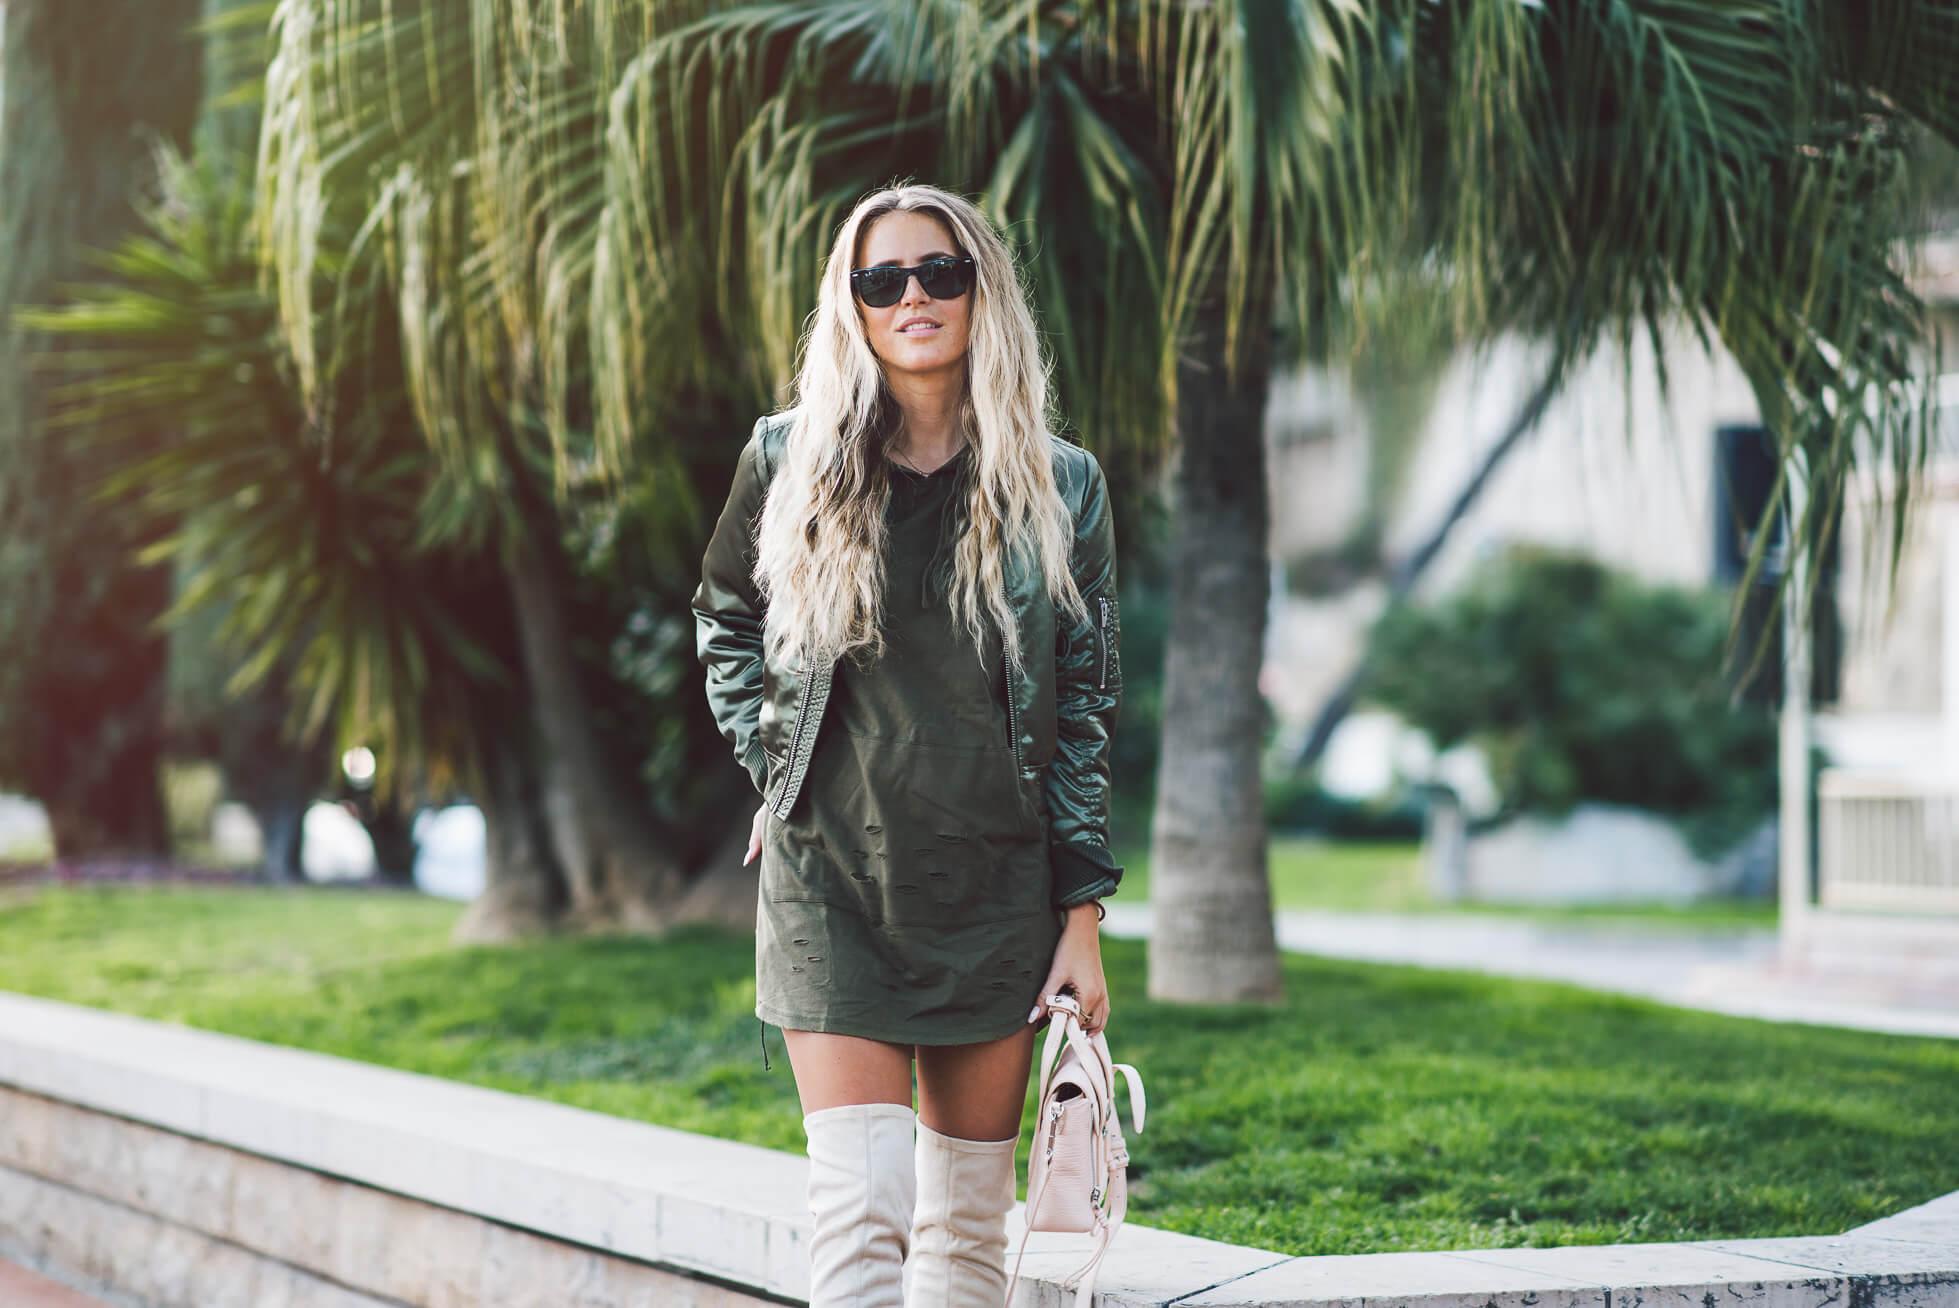 janni-deler-green-outfitDSC_9141-Redigera